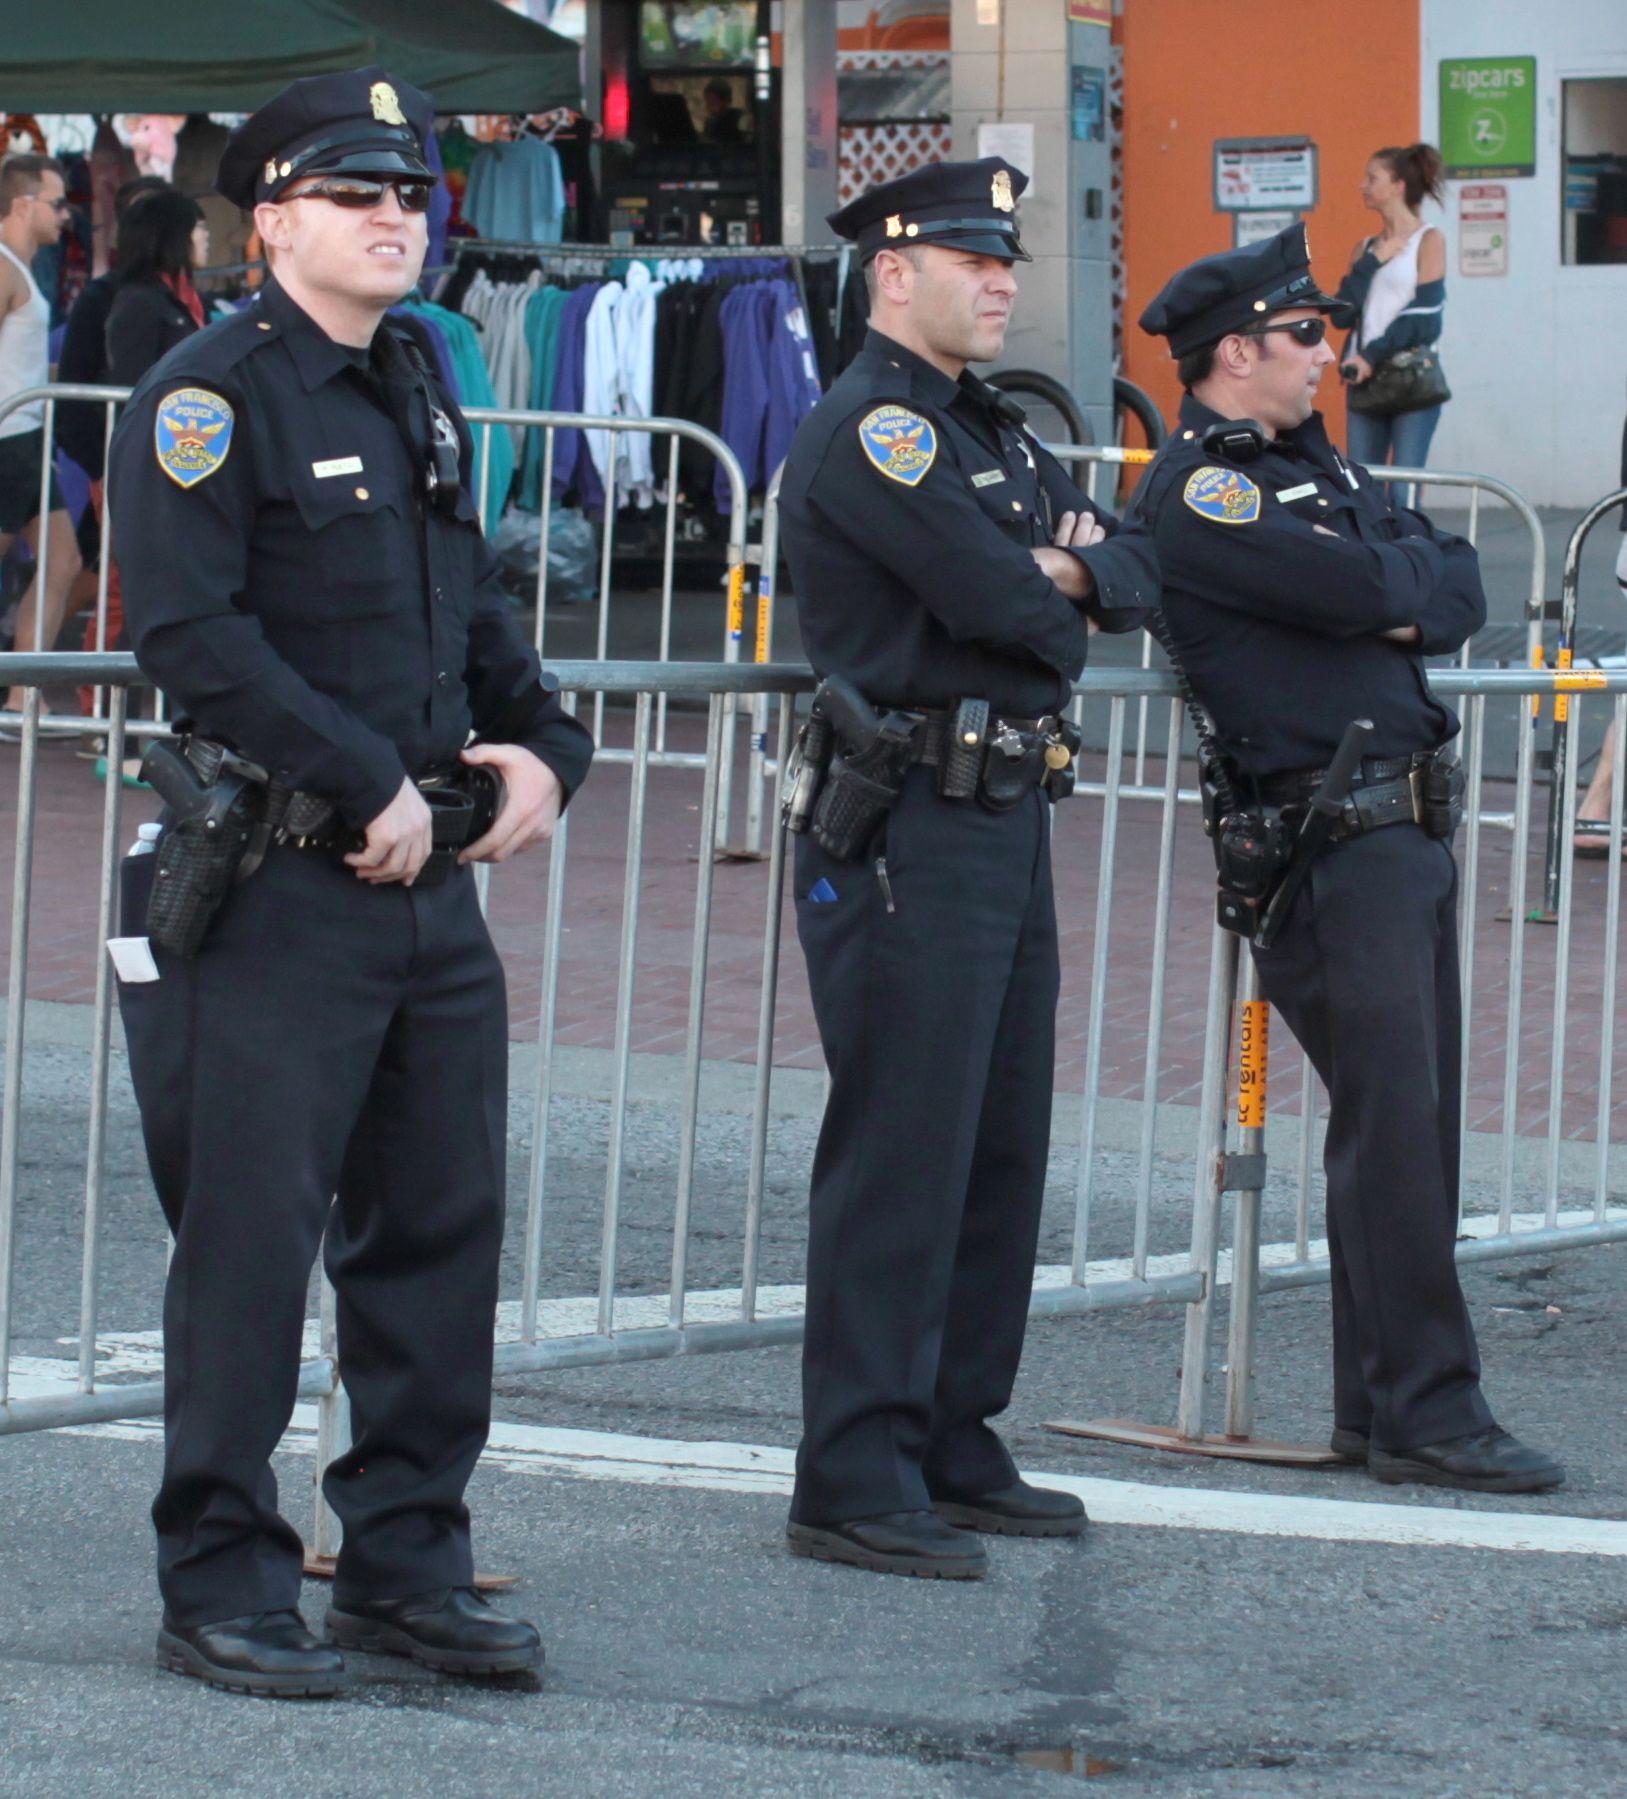 San Francisco Police Department Wikipedia The Free Encyclopedia Men In Uniform Police Uniforms Police